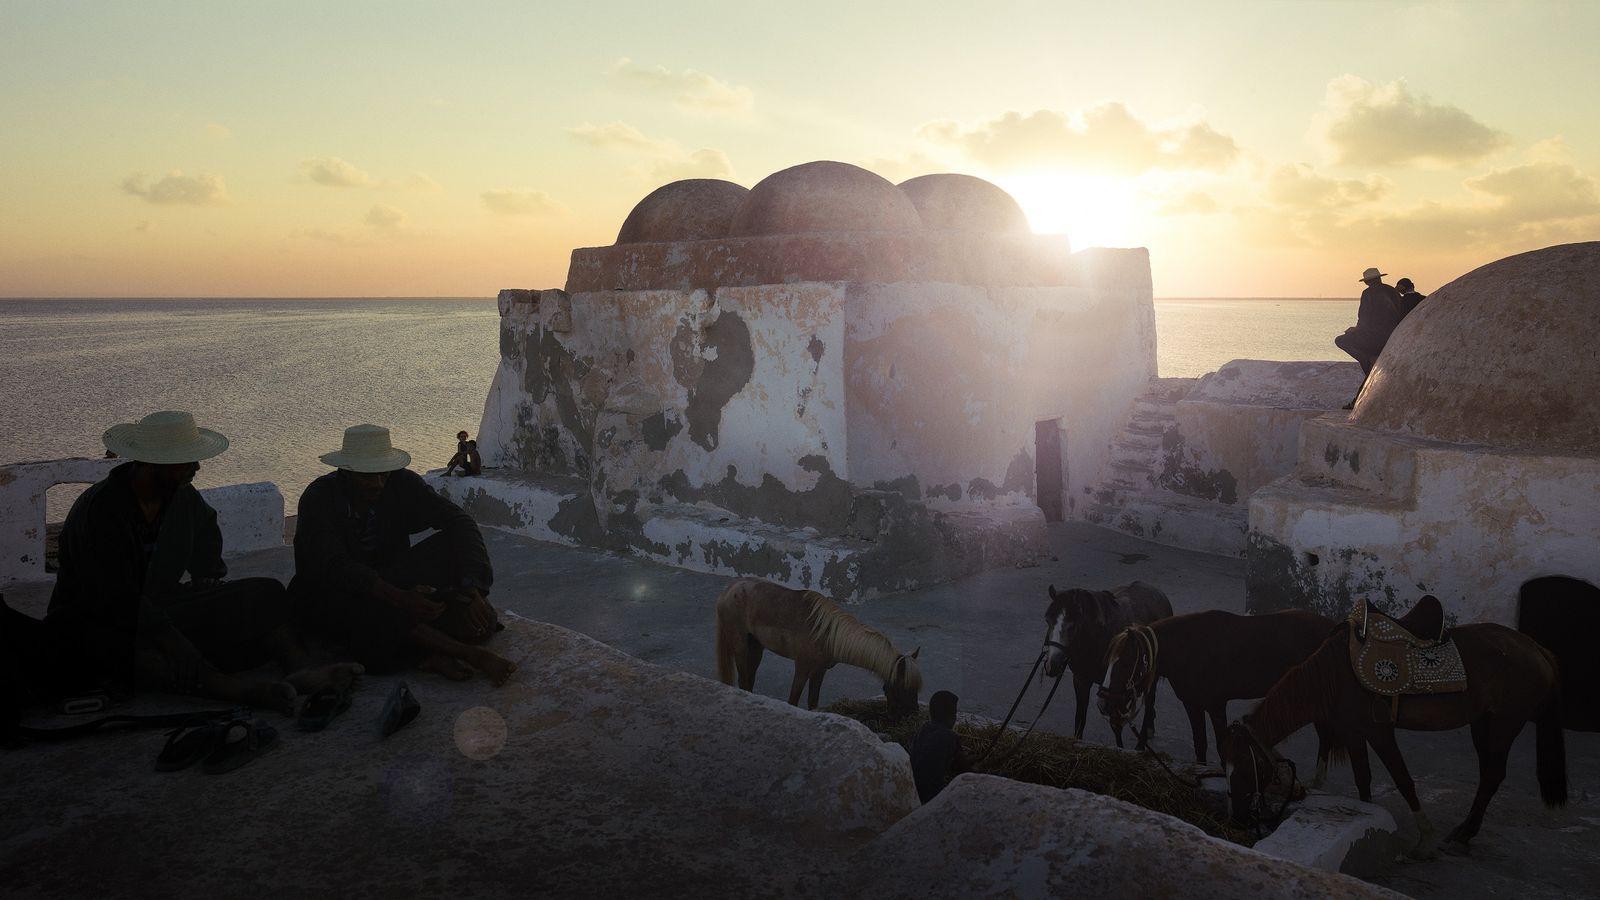 Coucher de soleil sur la mosquée Ibadide Sidi Yati, Djerba, Tunisie, 2018 -Djerba, appelée « l'île ...